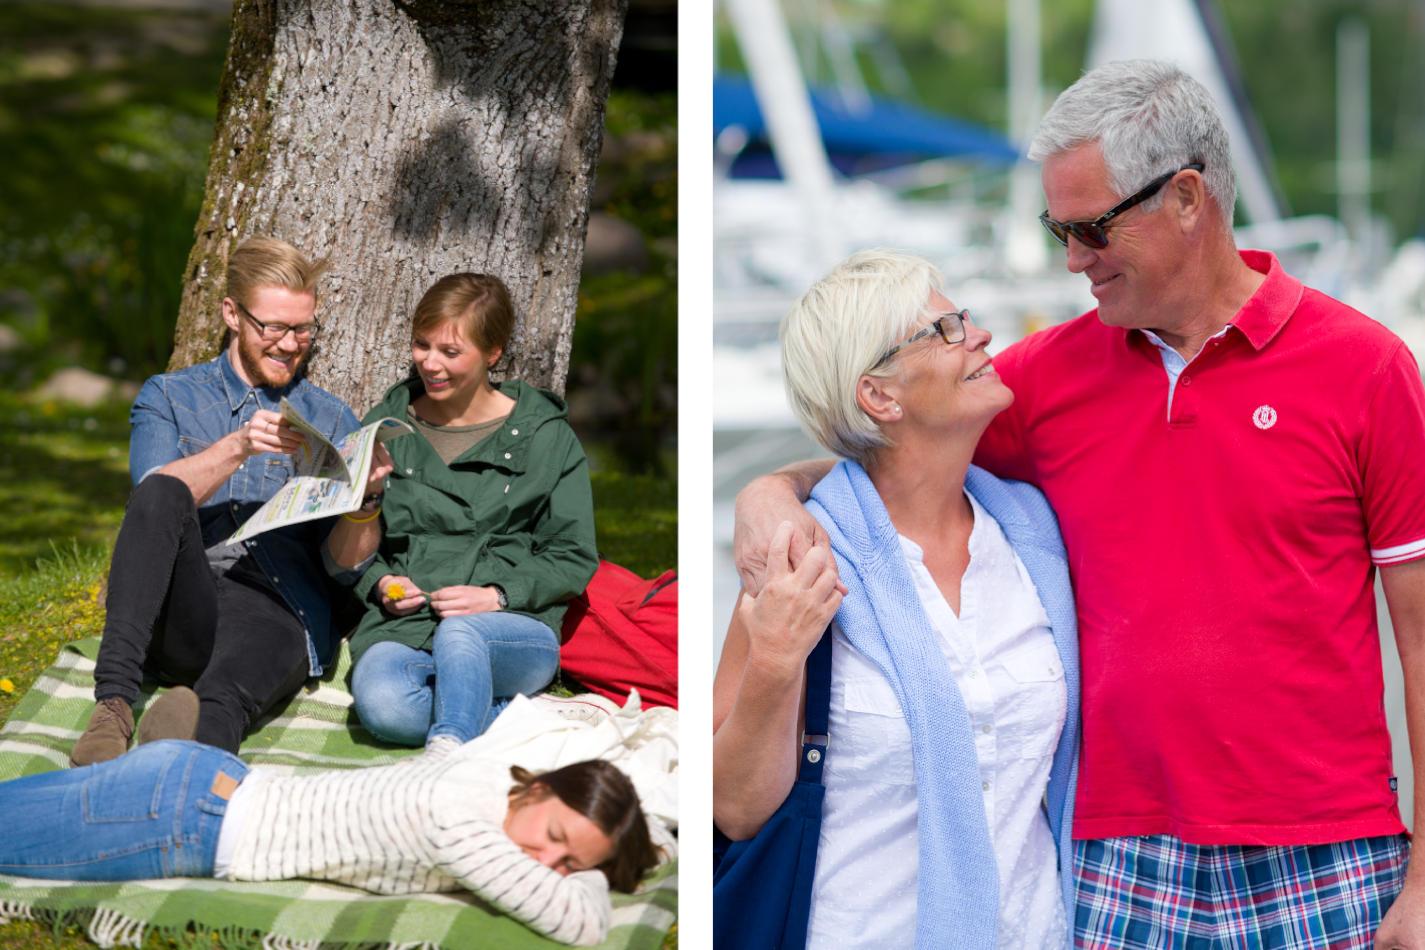 Östergötland: bringing together wildlife and city life - Scan Magazine